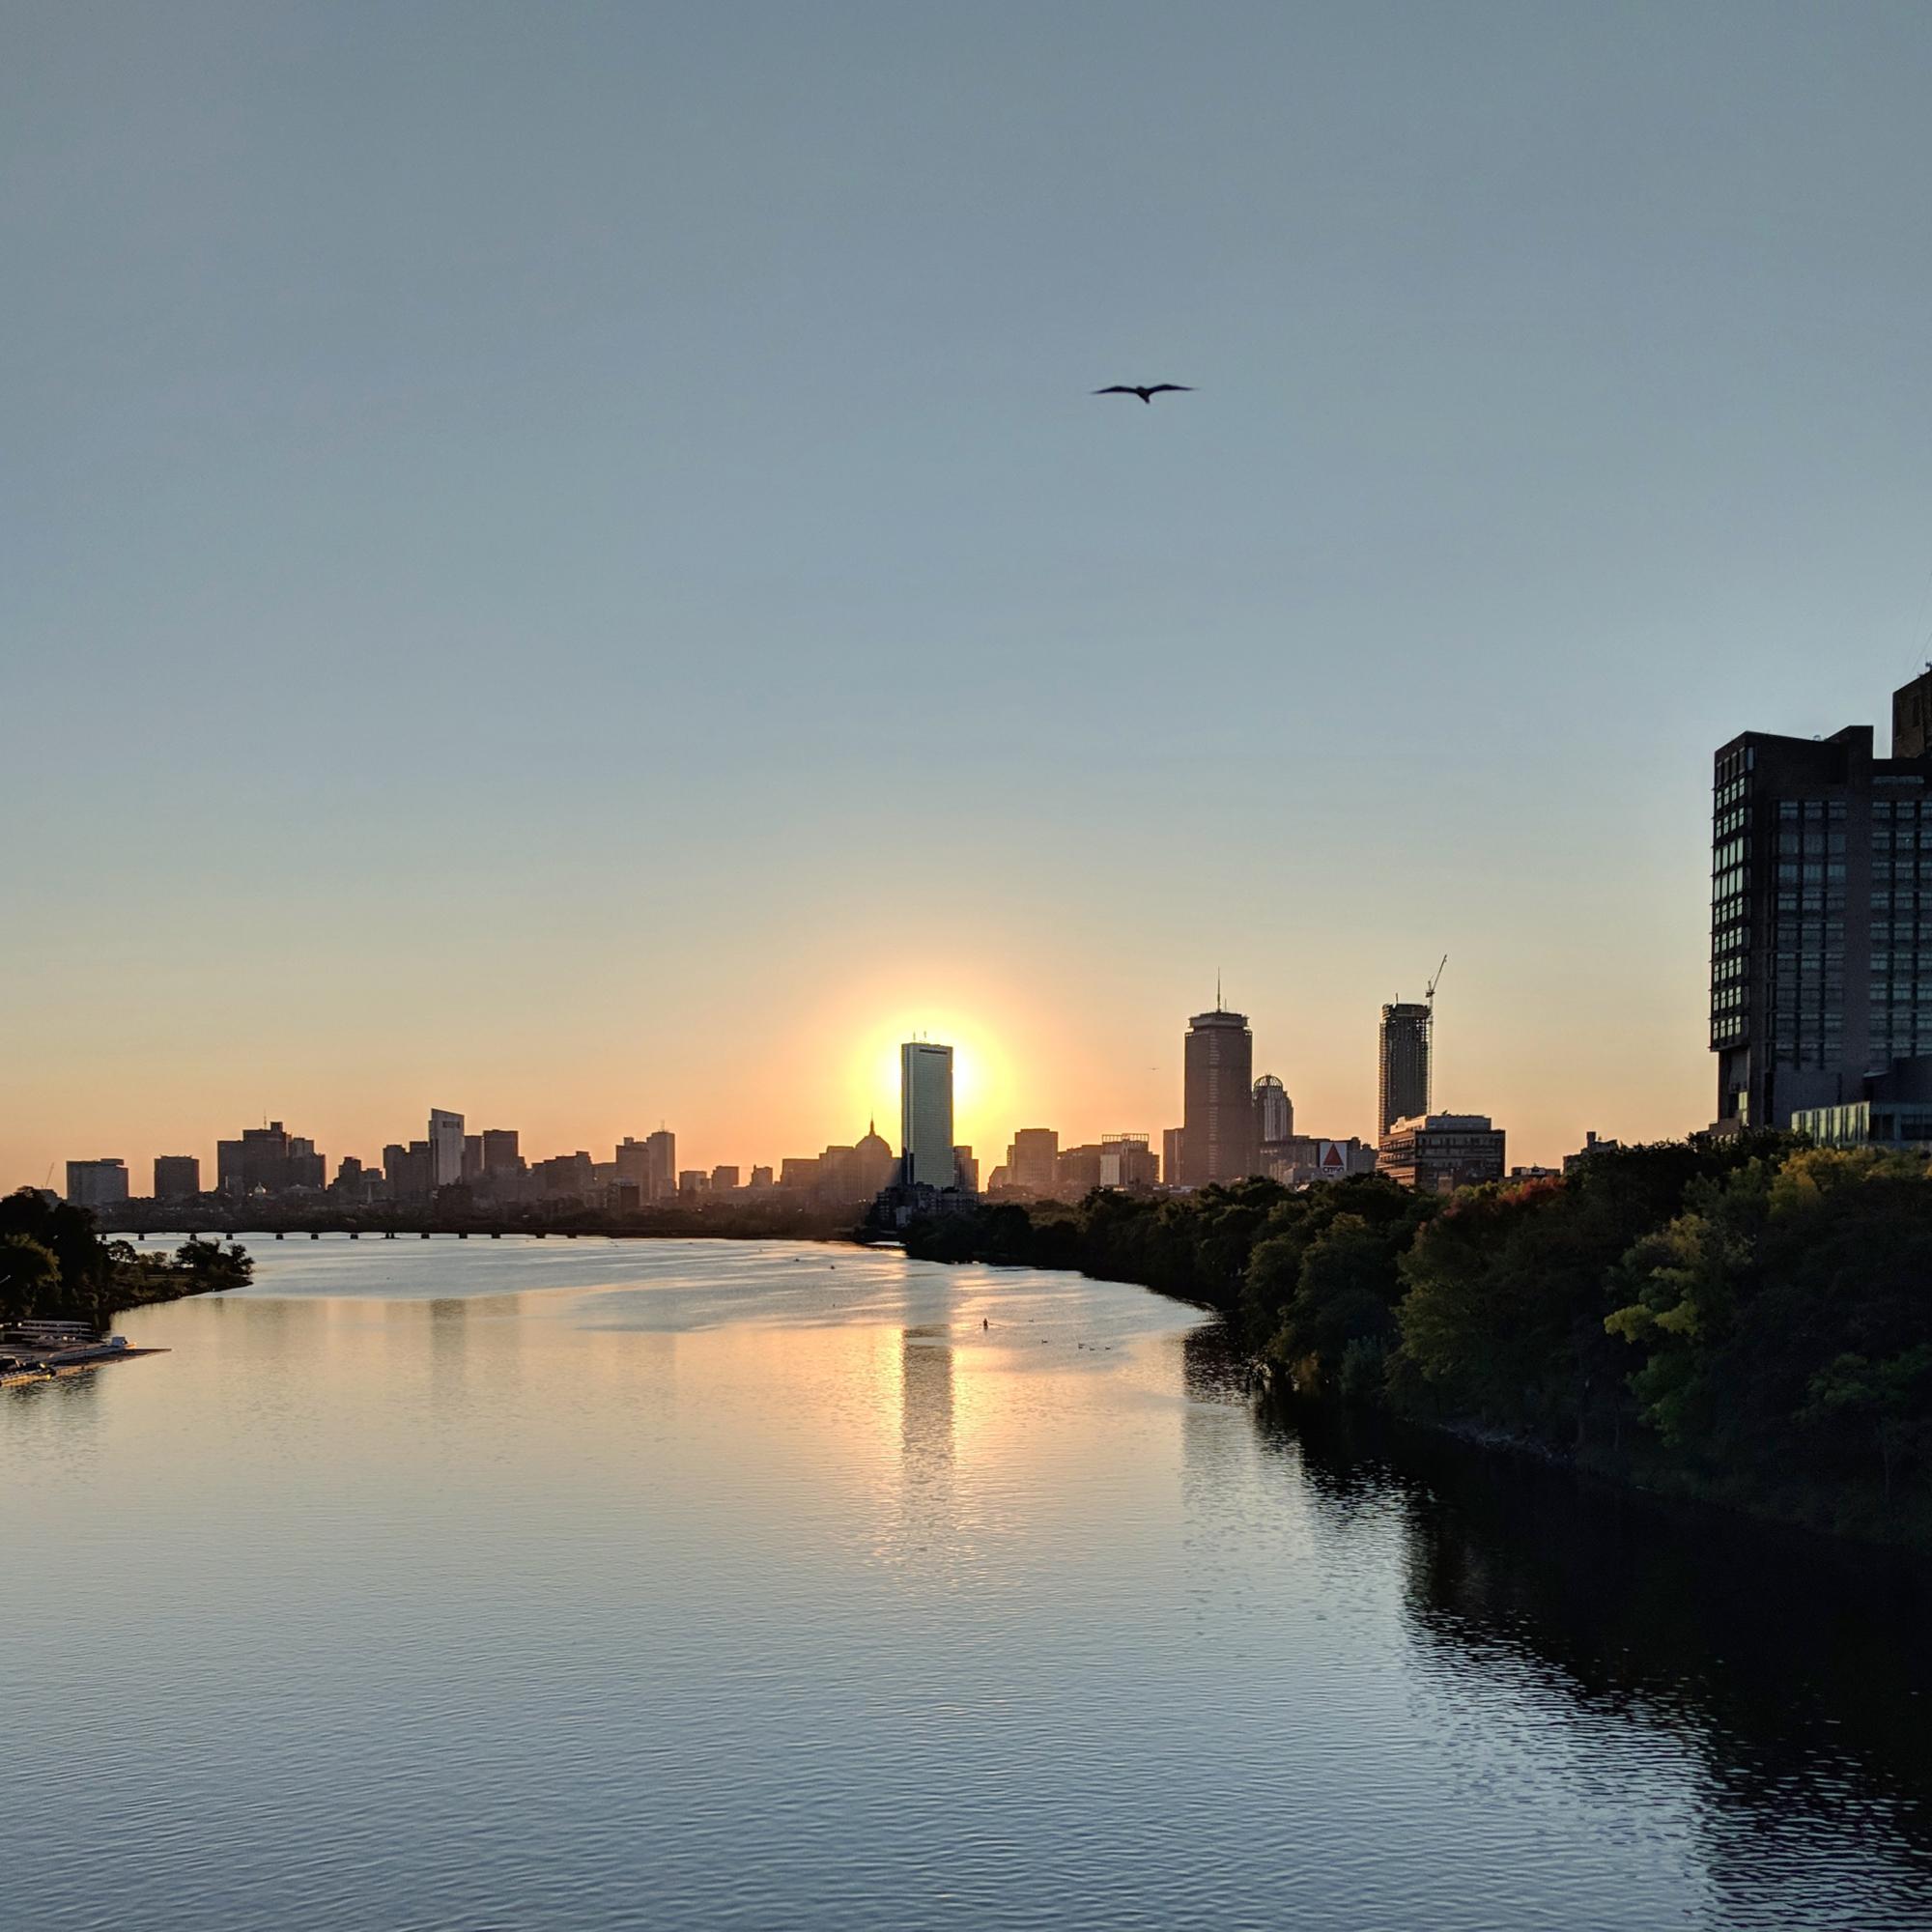 @rorydelapaz - Charles River, Boston, MA